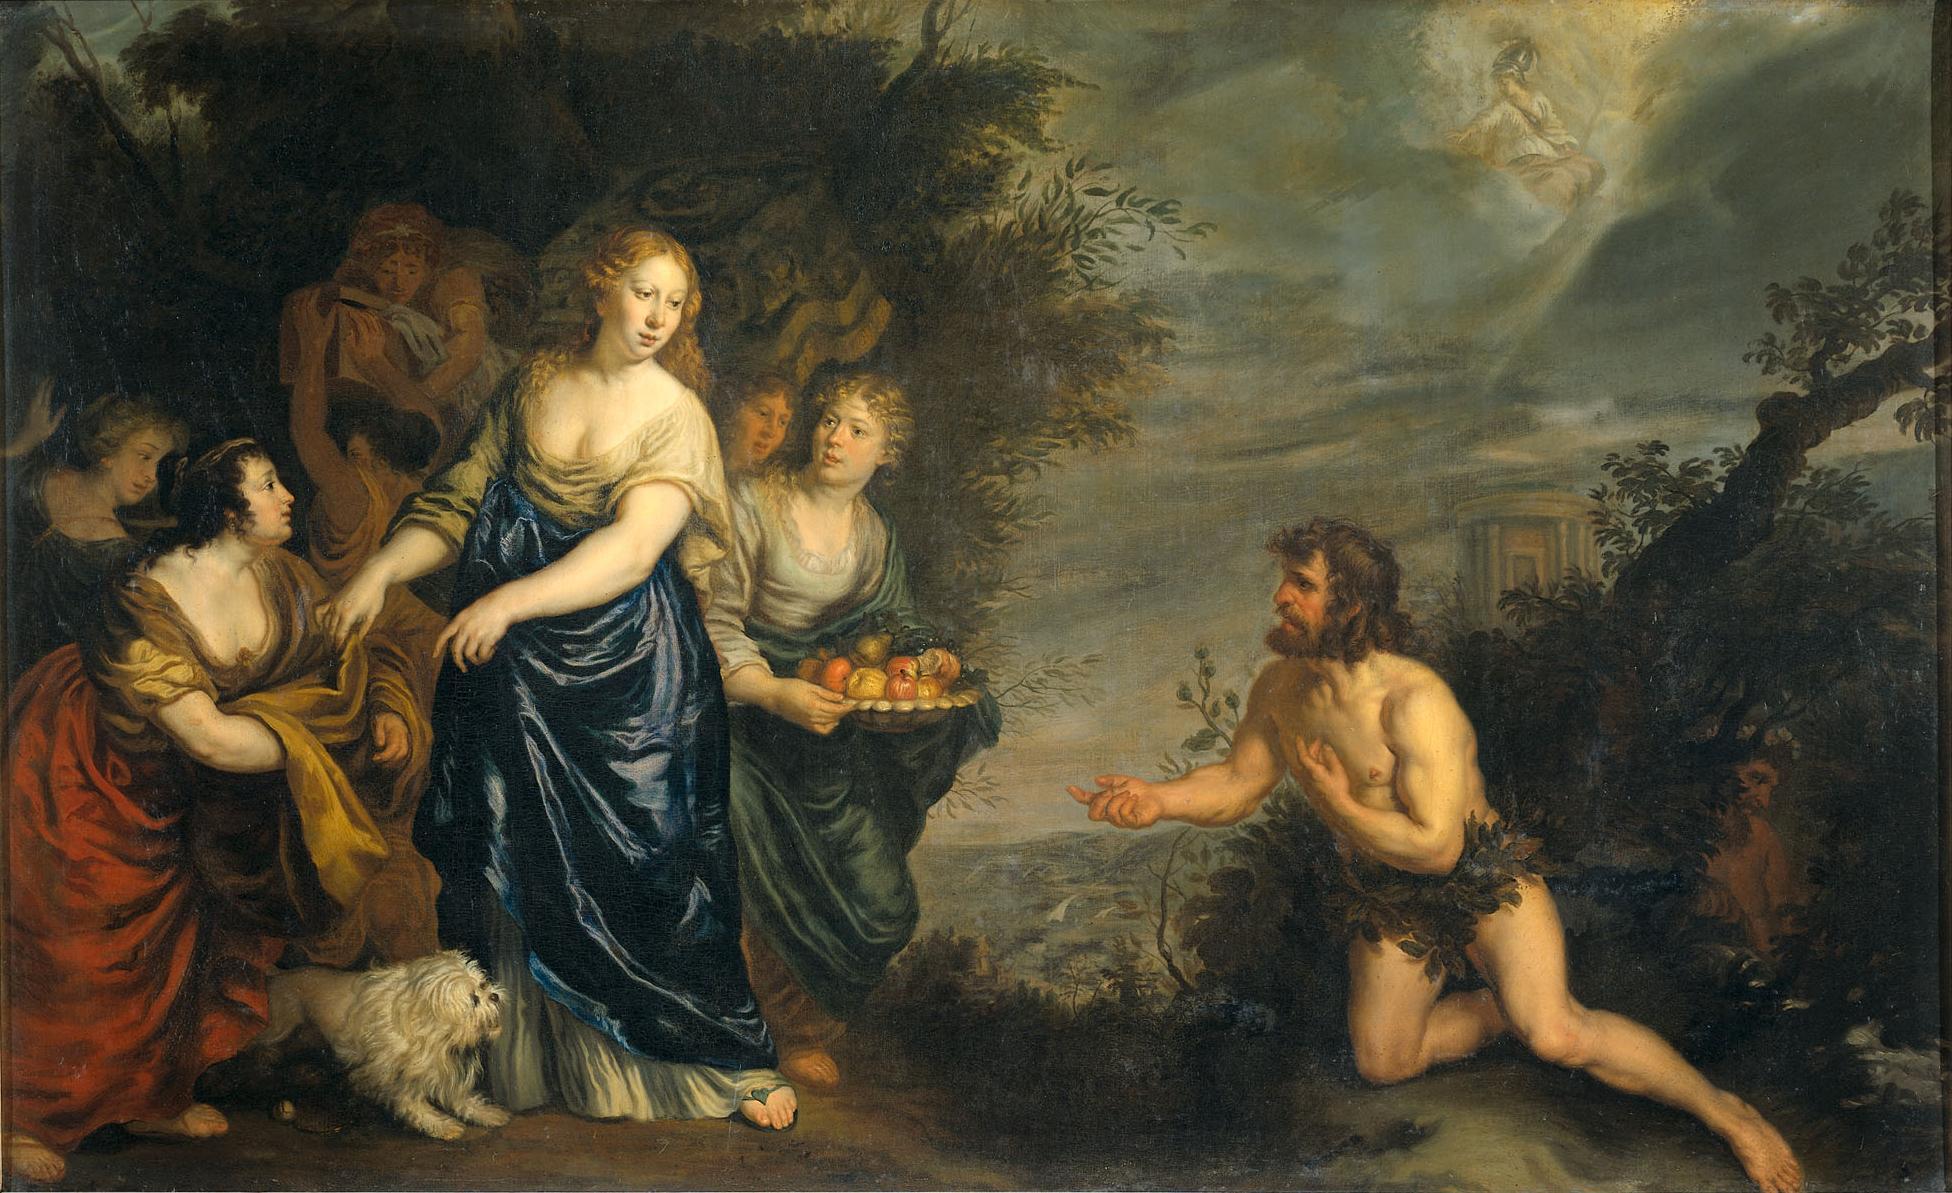 Odysseus and Nausicaa (Sandrart)